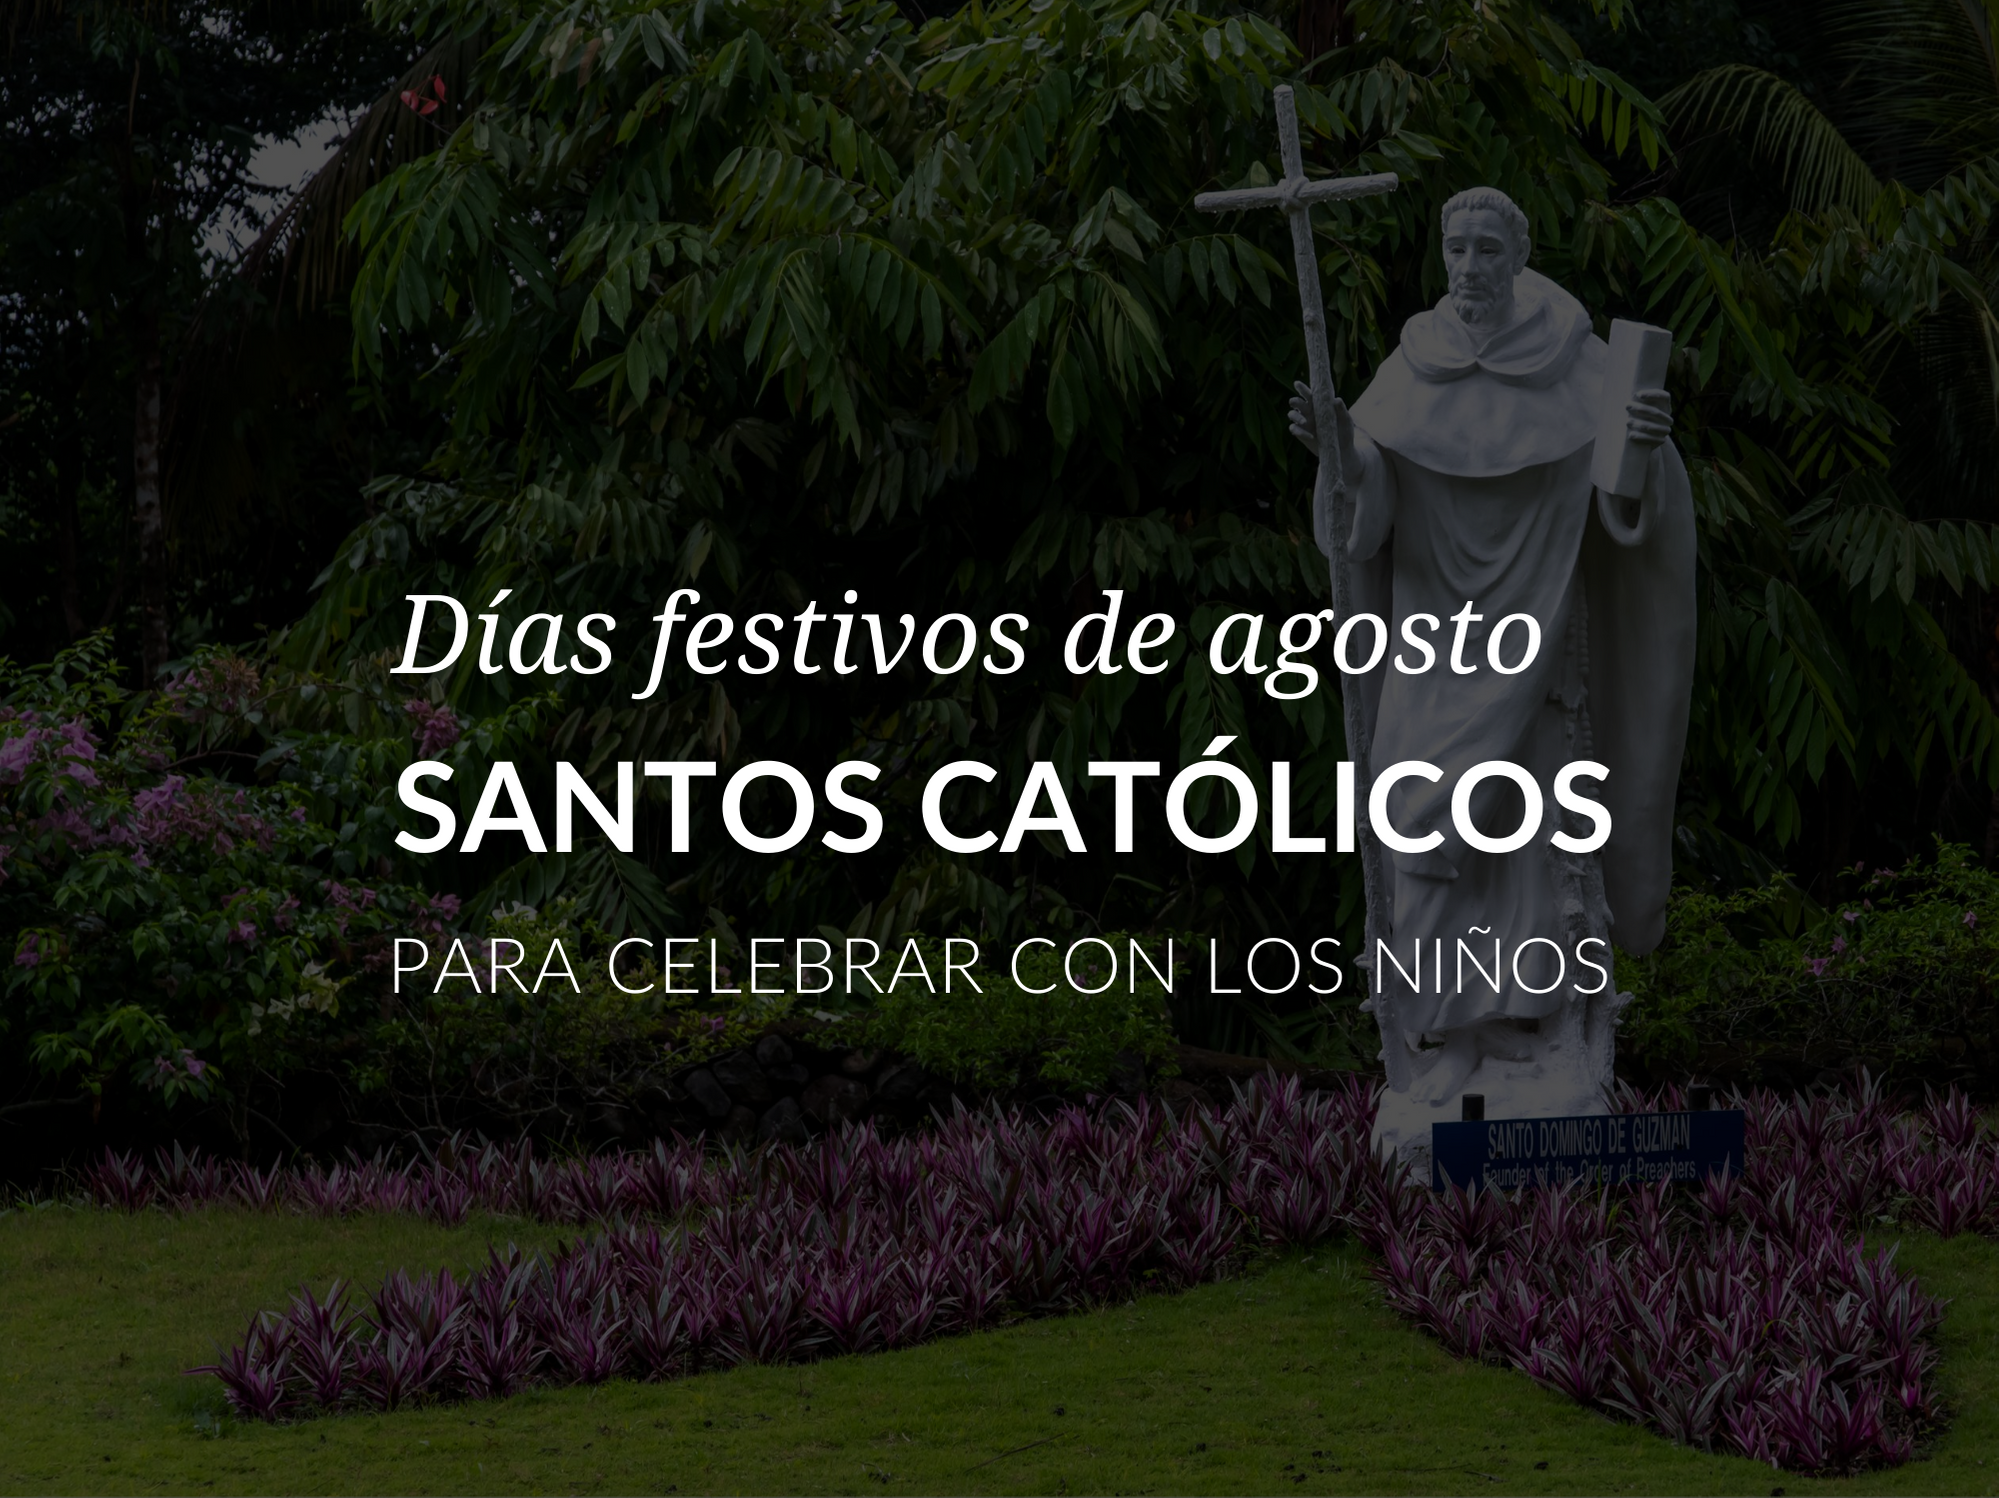 dias-festivos-de-agosta-santos-catolicos-para-celebrar-con-los-ninos